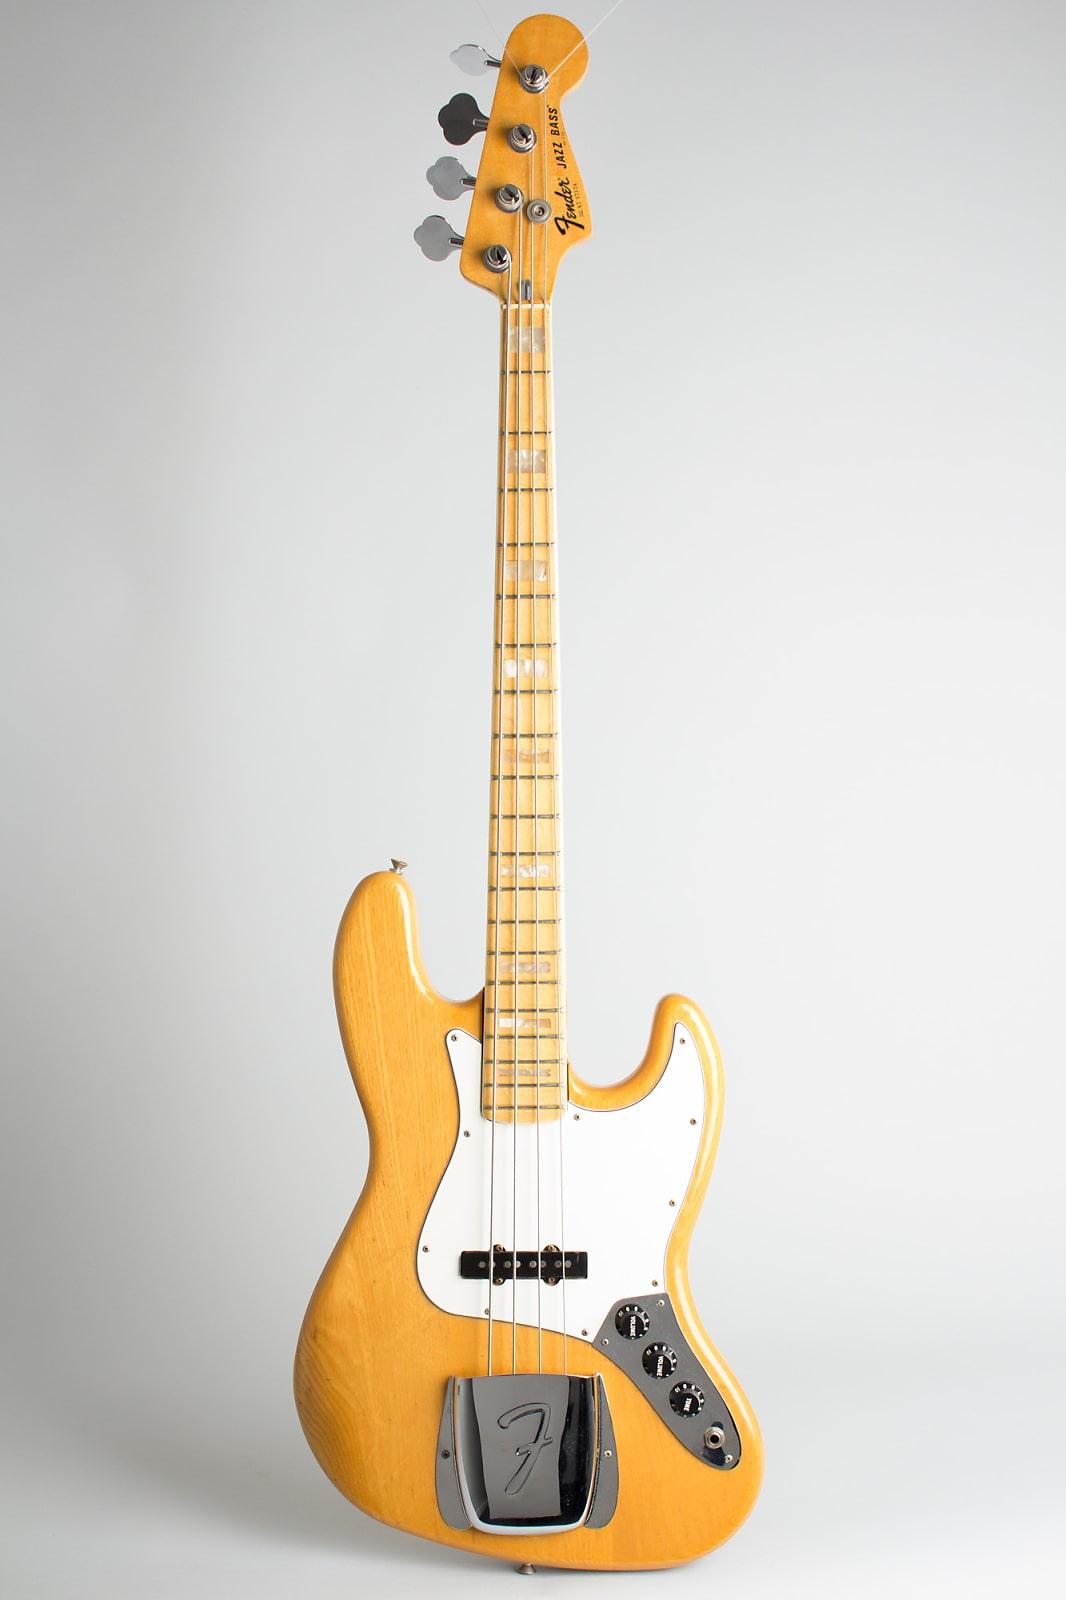 Fender  Jazz Bass Solid Body Electric Bass Guitar (1978), ser. #S7-37324, original black hard shell case.